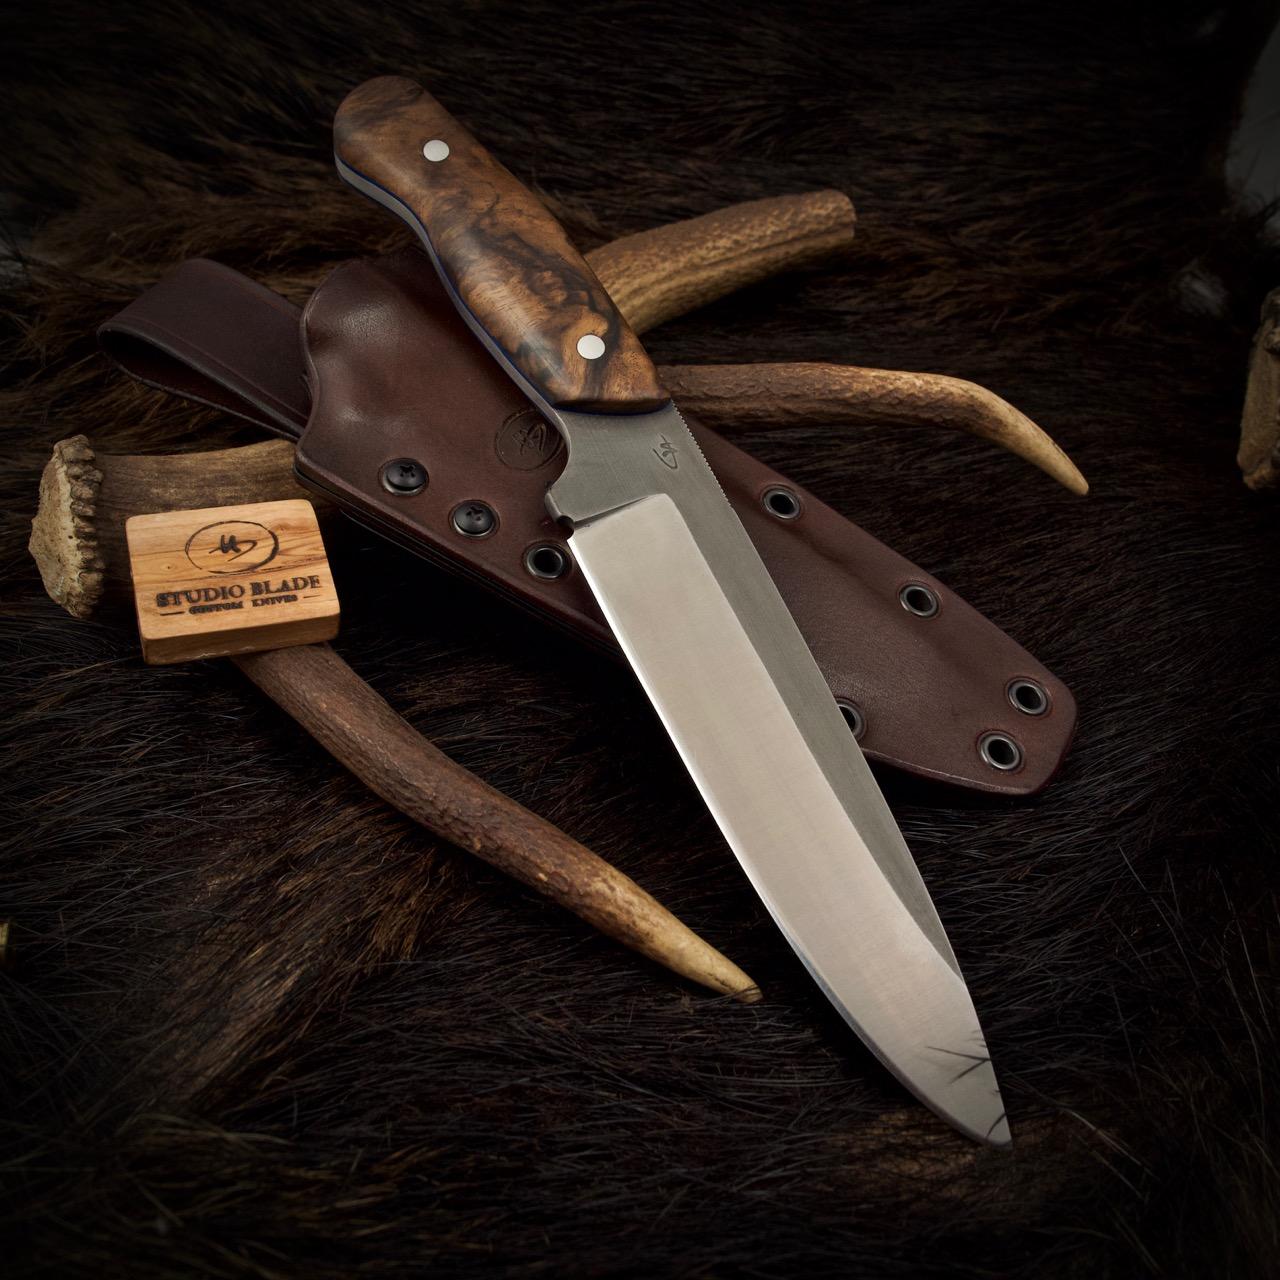 Studio Blade Wild Boar Hunter Custom Knife